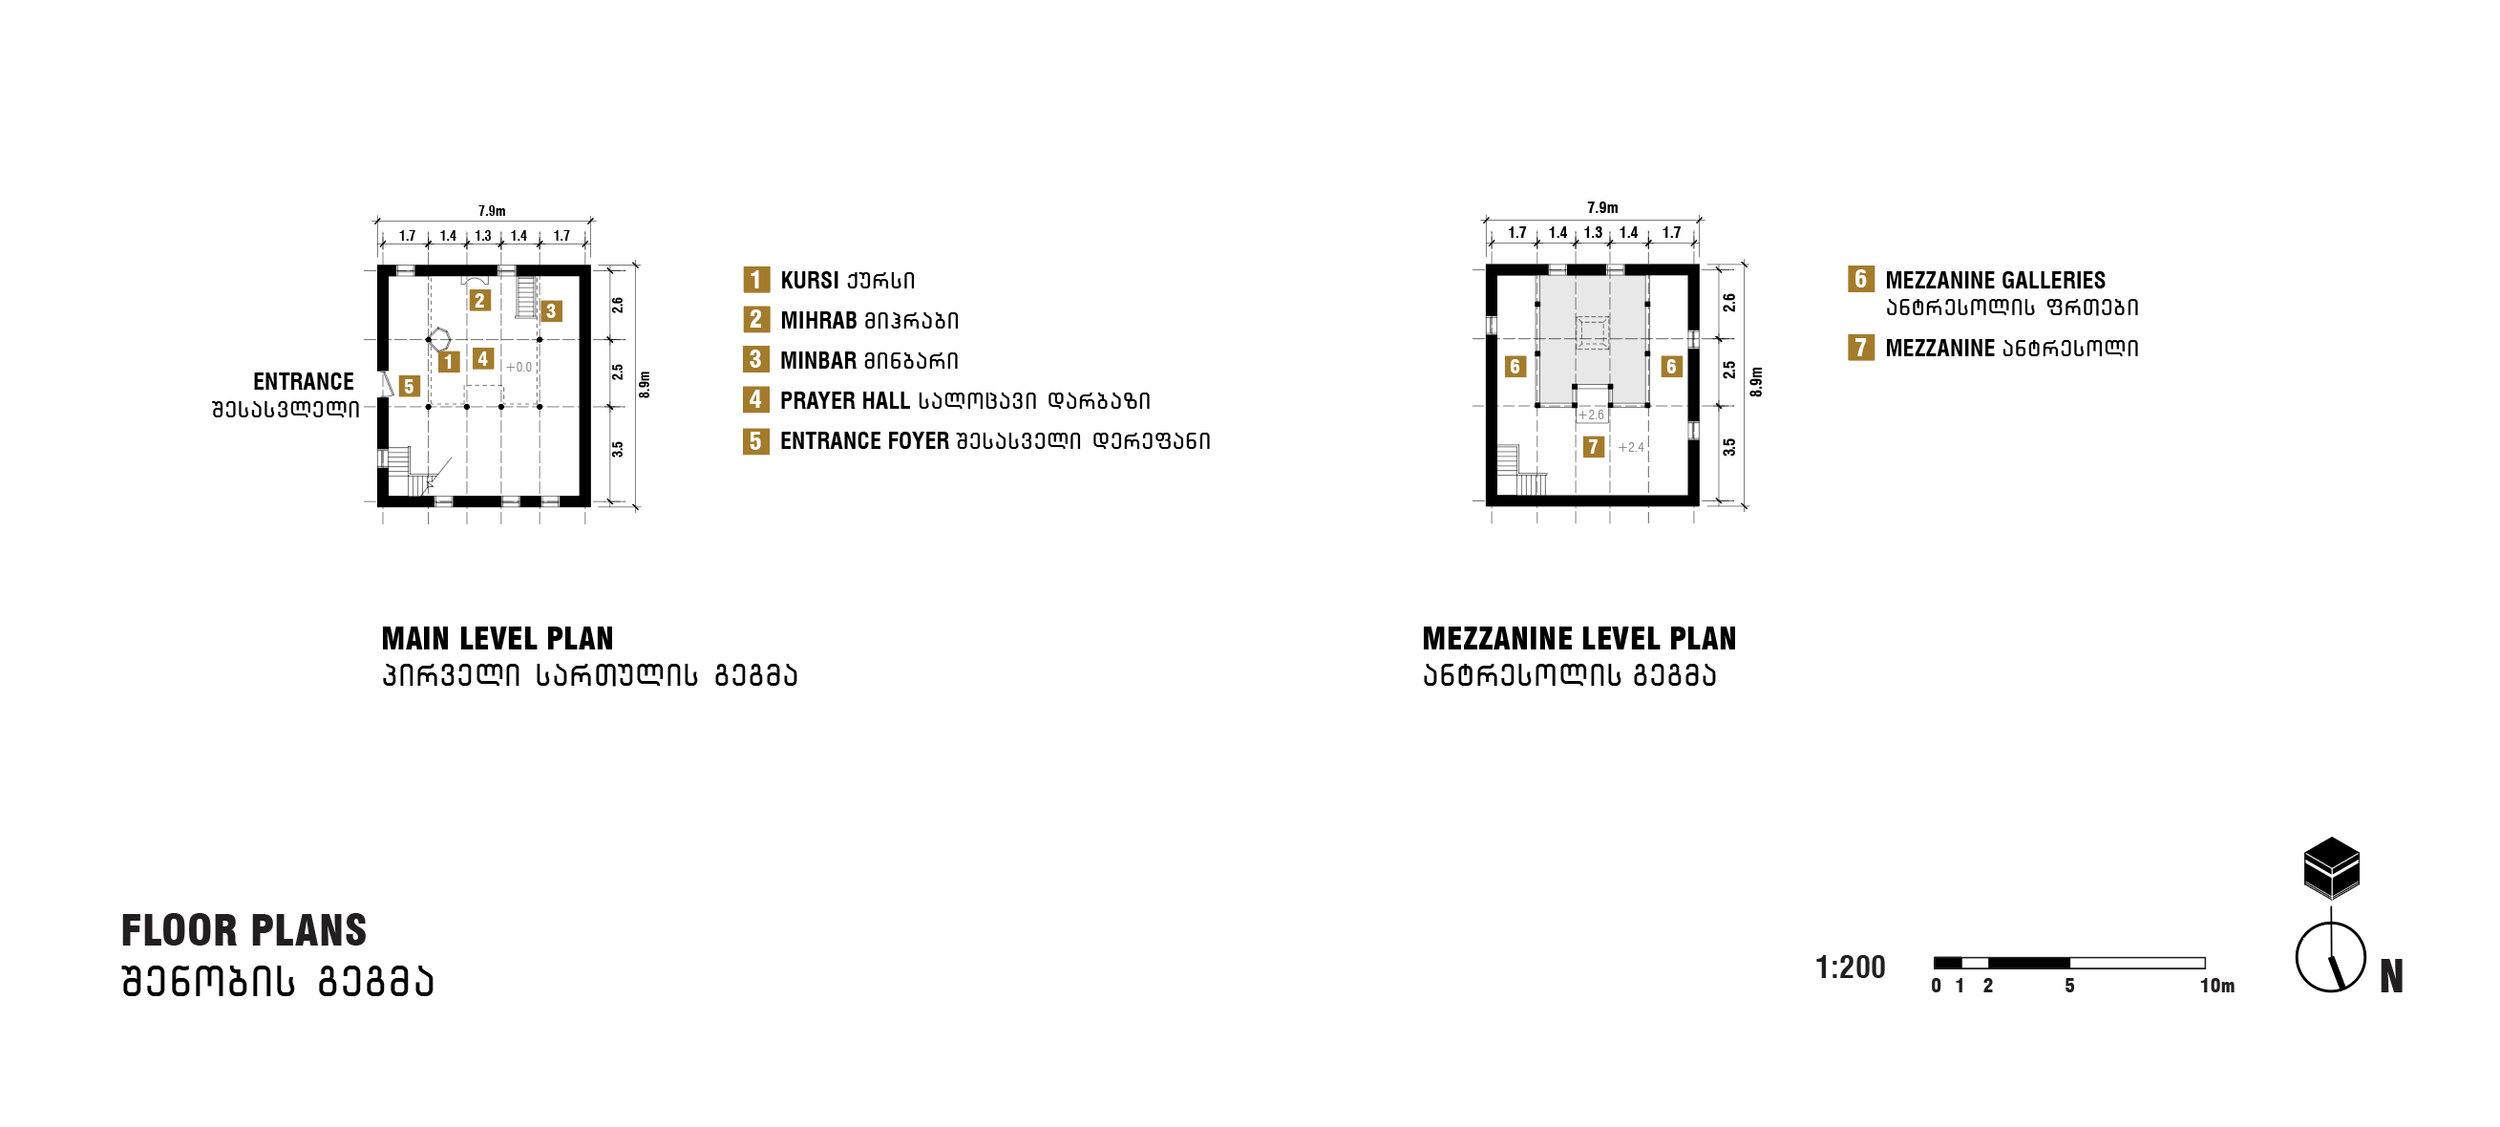 Makhalakidzeebi Floorplans.jpg